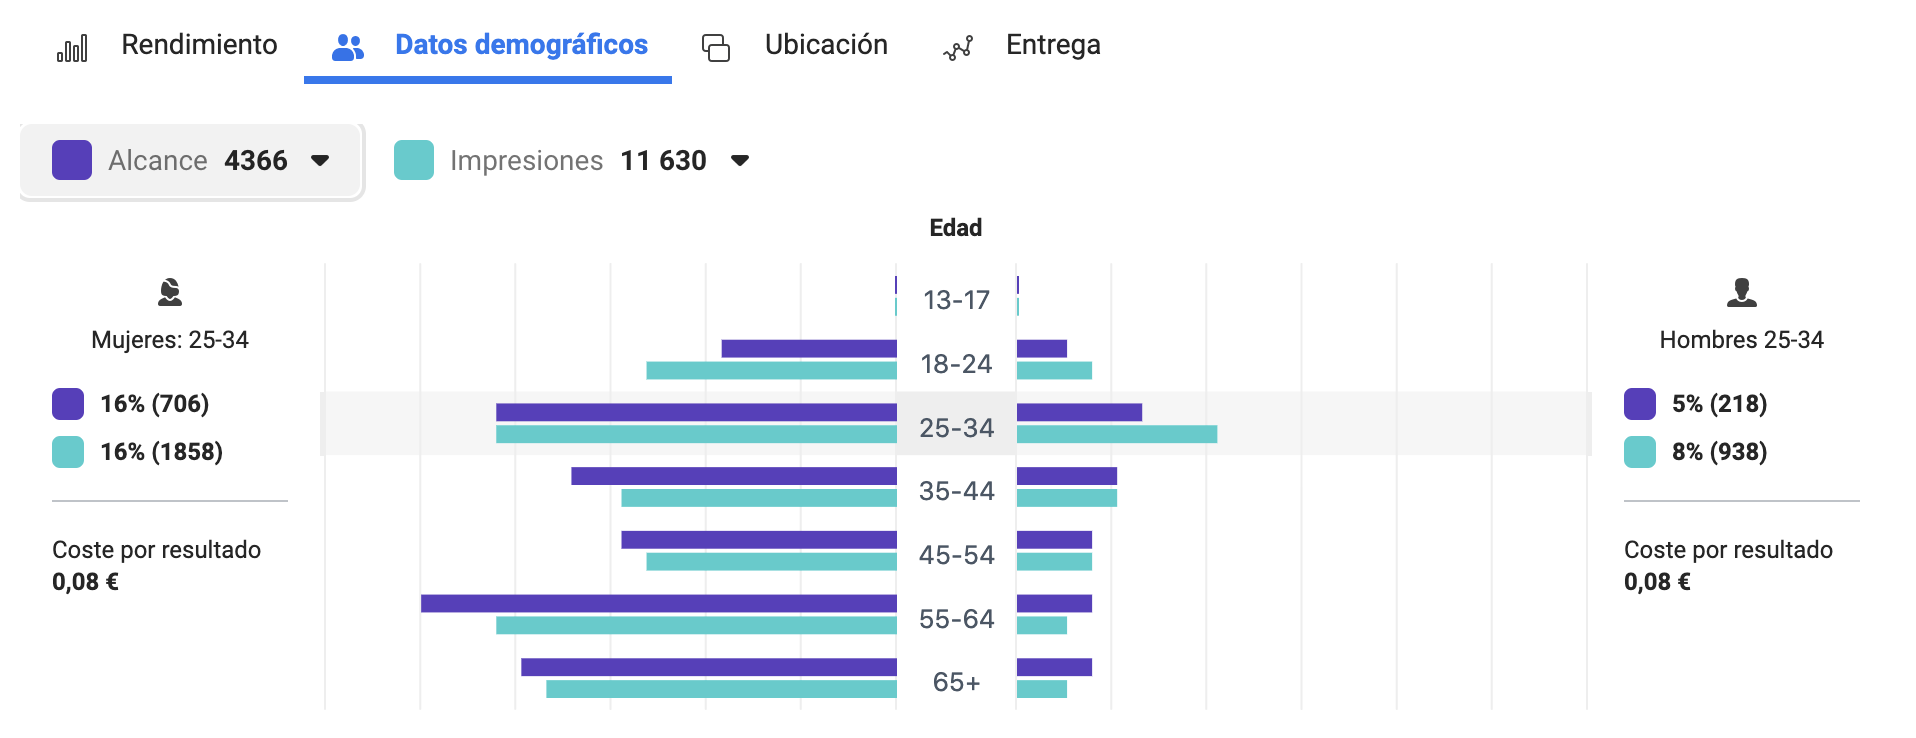 Rendimiento Datos demográficos